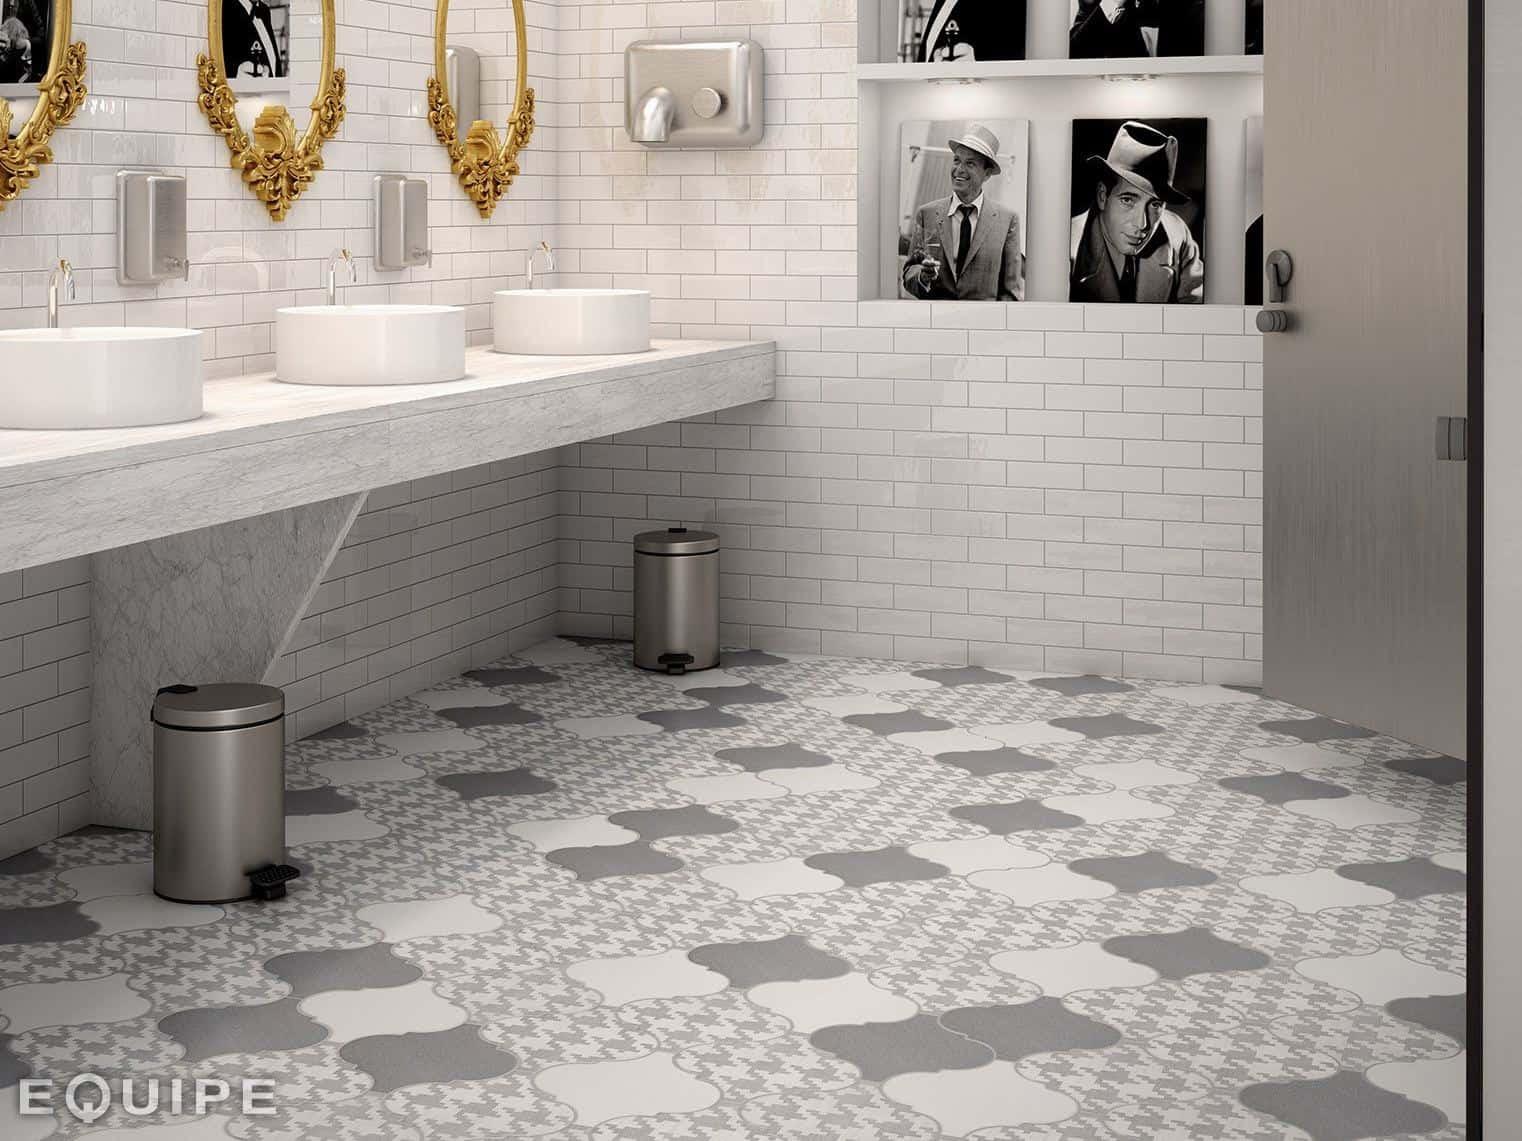 21 Arabesque Tile Ideas for Floor, Wall and Backsplash